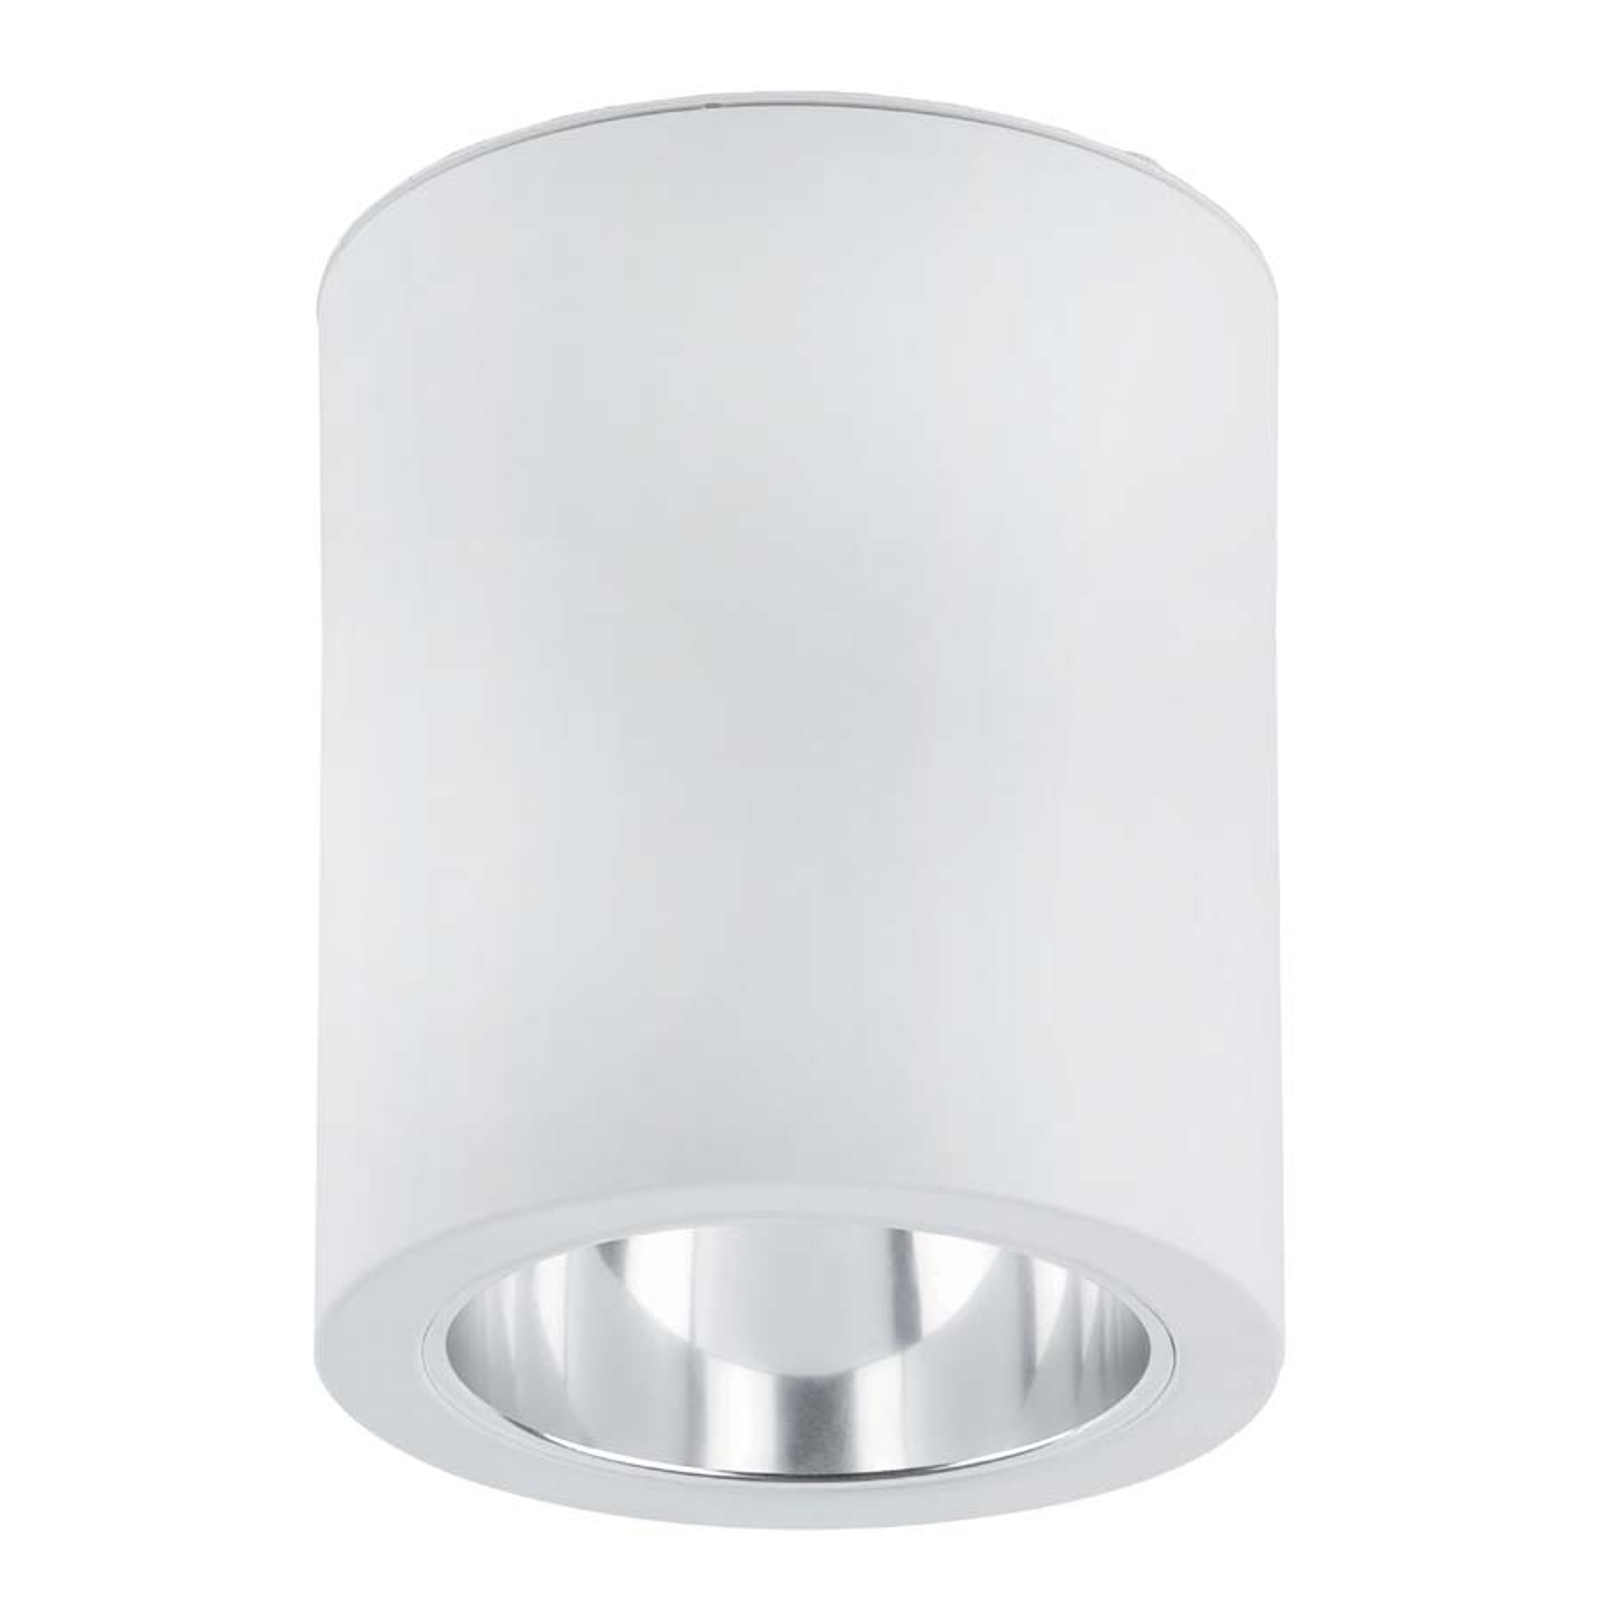 Esthetische plafondlamp Pote-1 van aluminium